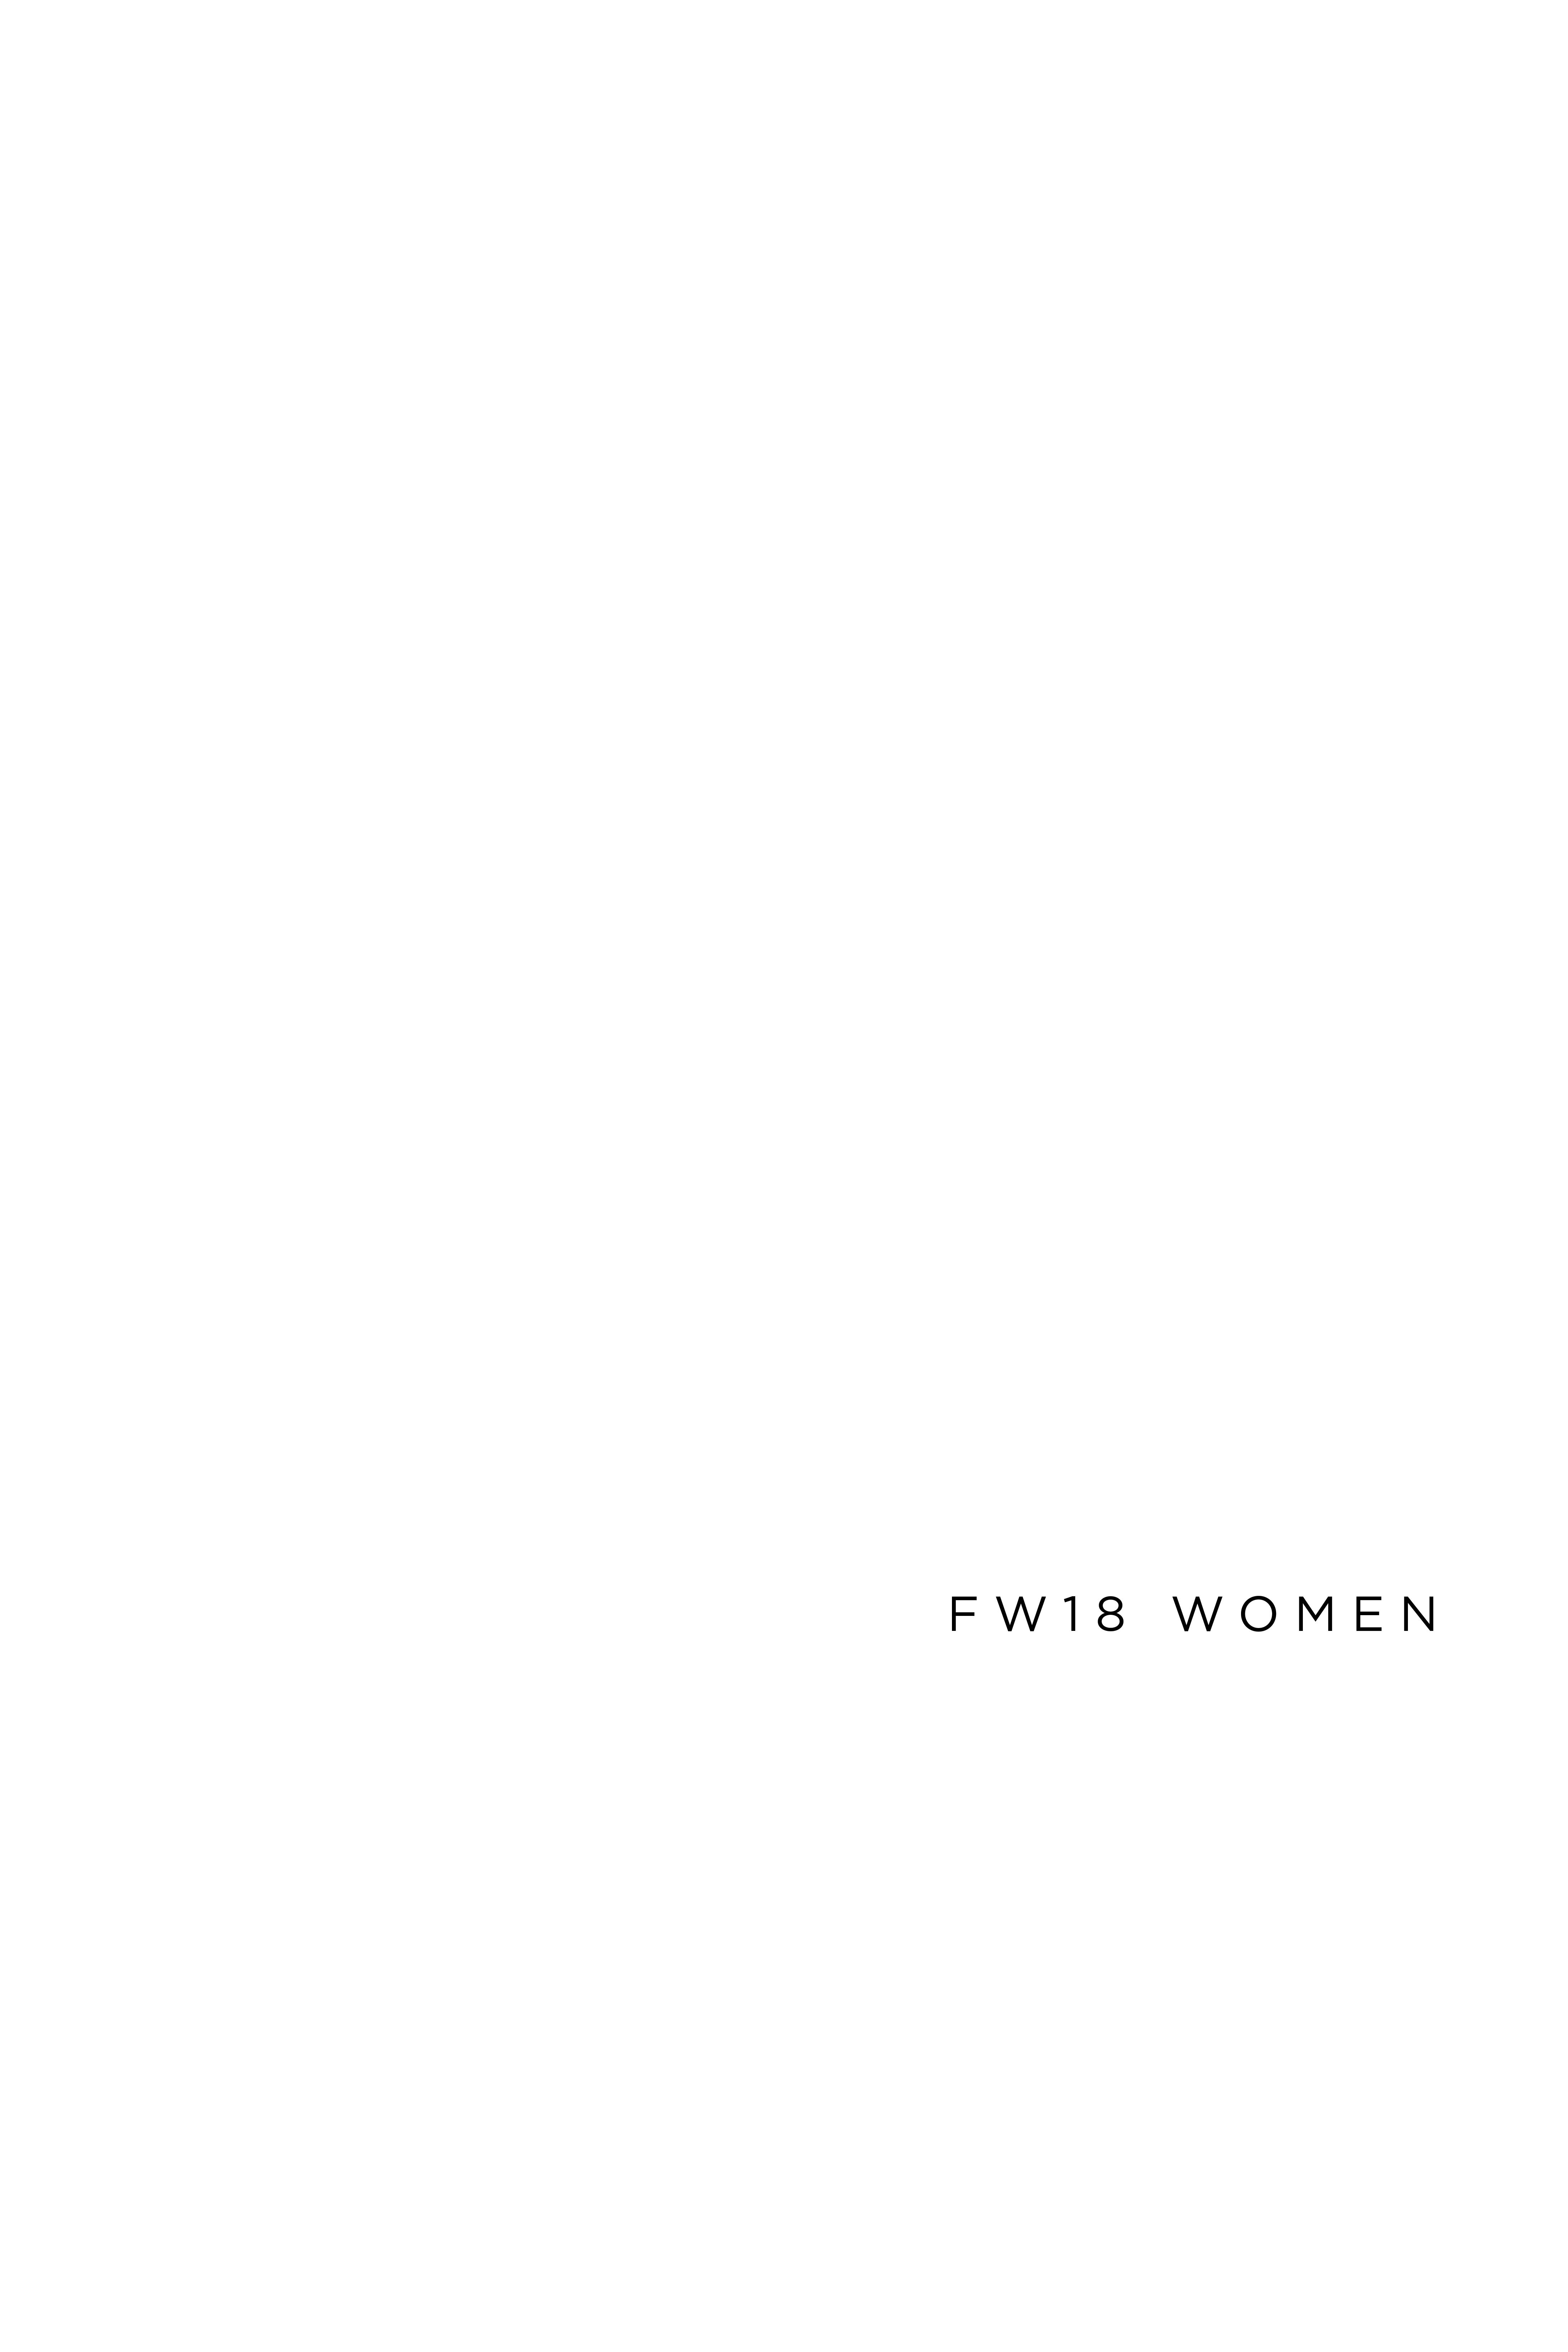 Fw18women